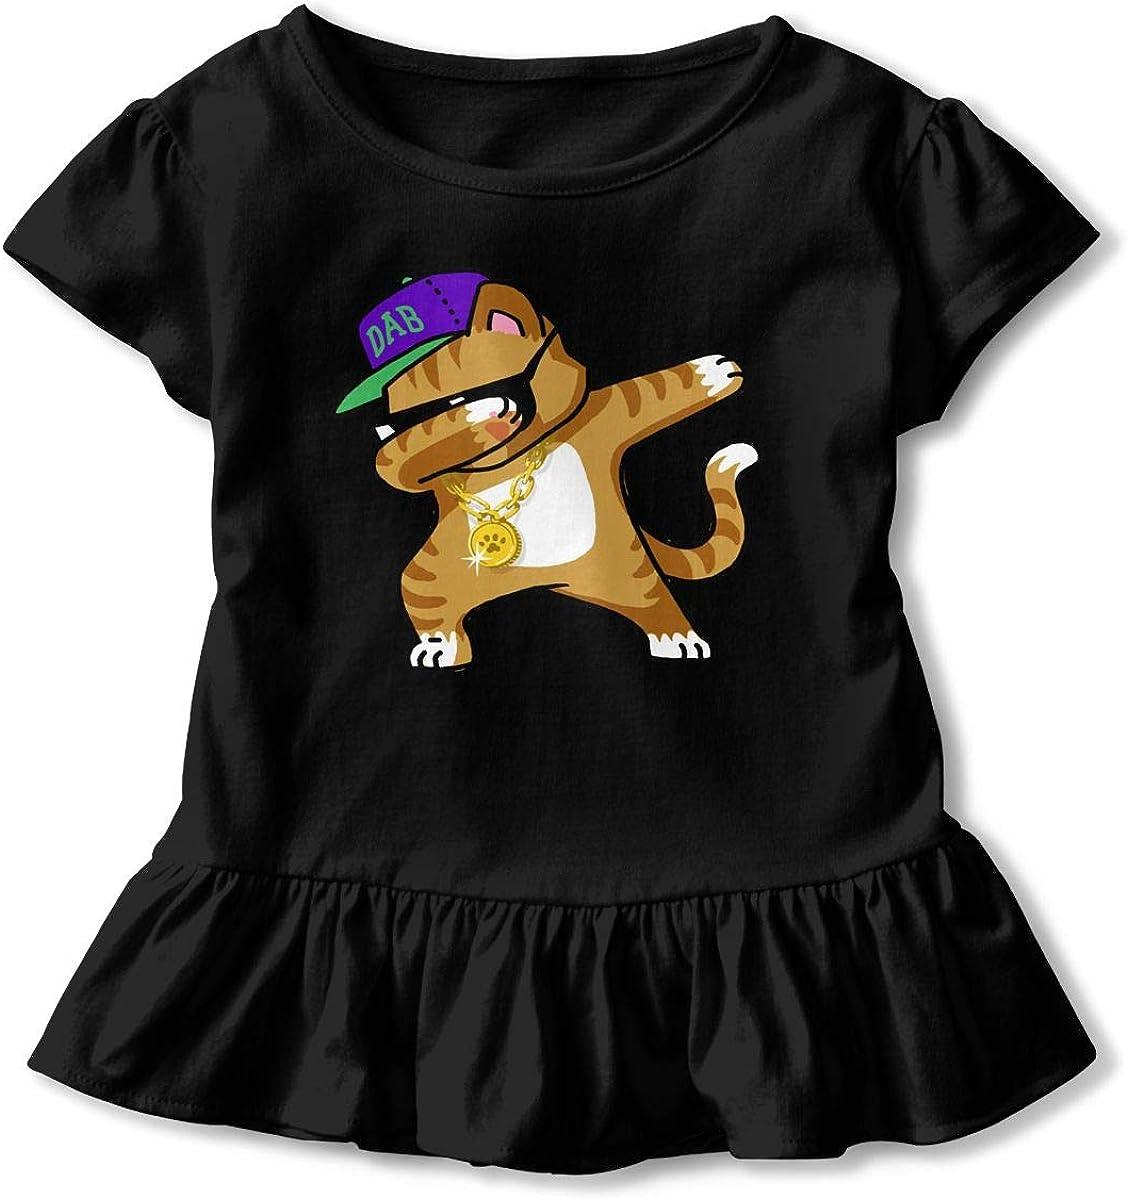 Dabbing Cat Funny Toddler Girls T Shirt Kids Cotton Short Sleeve Ruffle Tee